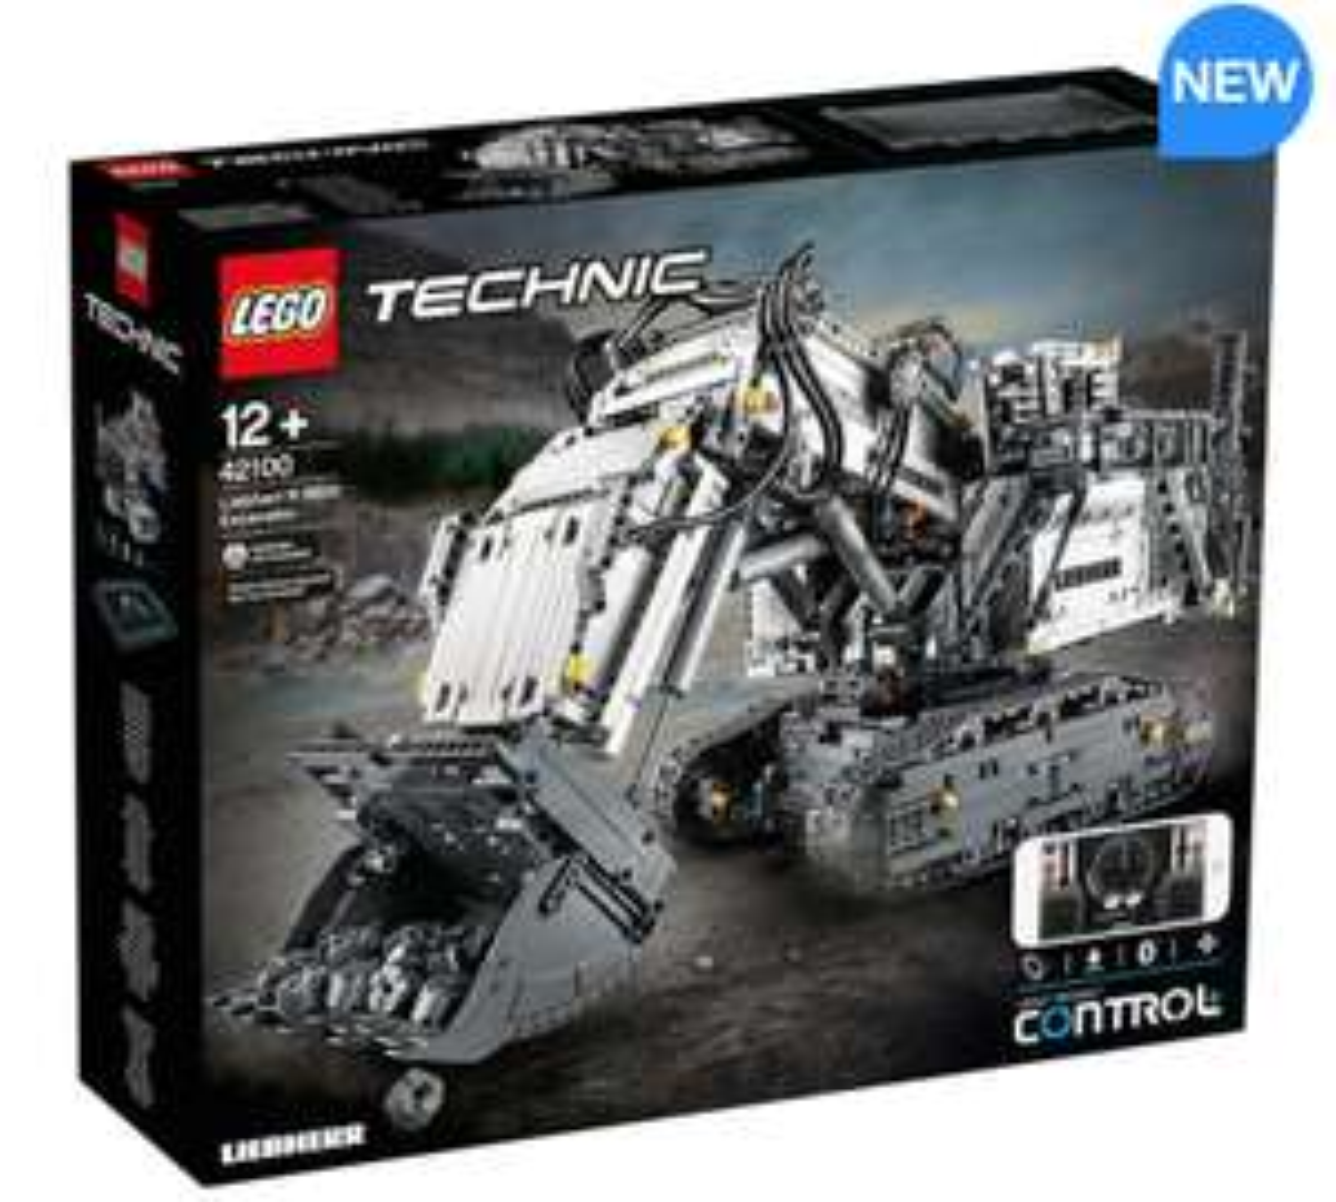 42100 Lego Technic Liebherr R9800 Excavator - £289.99 inc delivery at Costco online